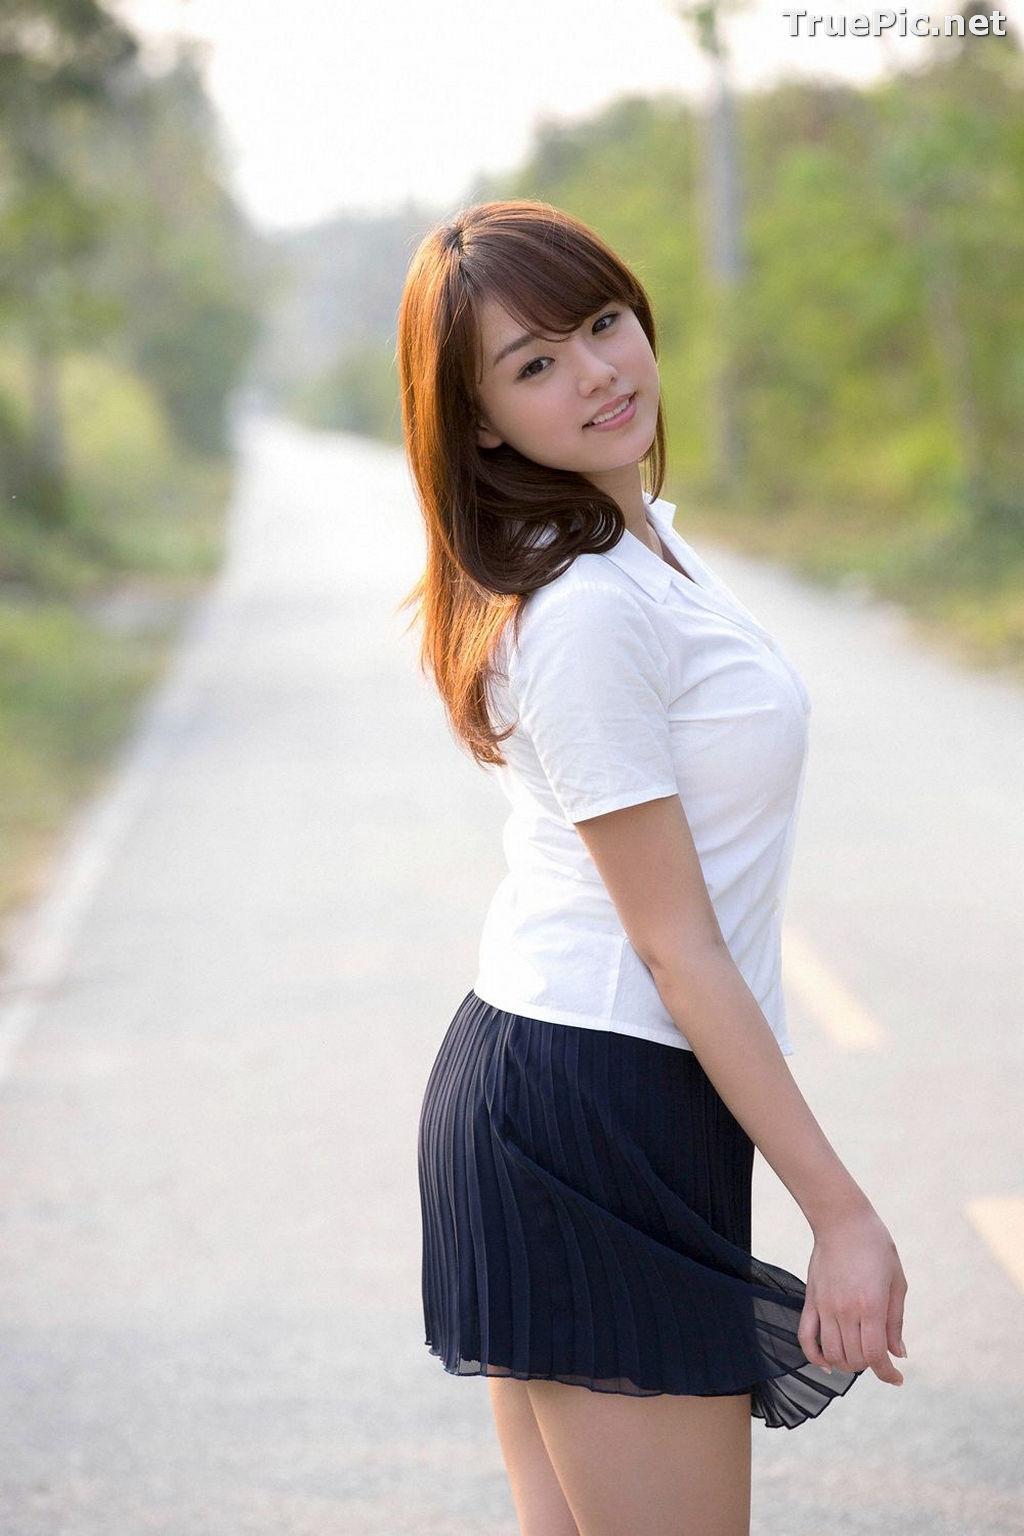 Image [YS Web] Vol.560 - Japanese Gravure Idol and Singer - Ai Shinozaki - TruePic.net - Picture-2